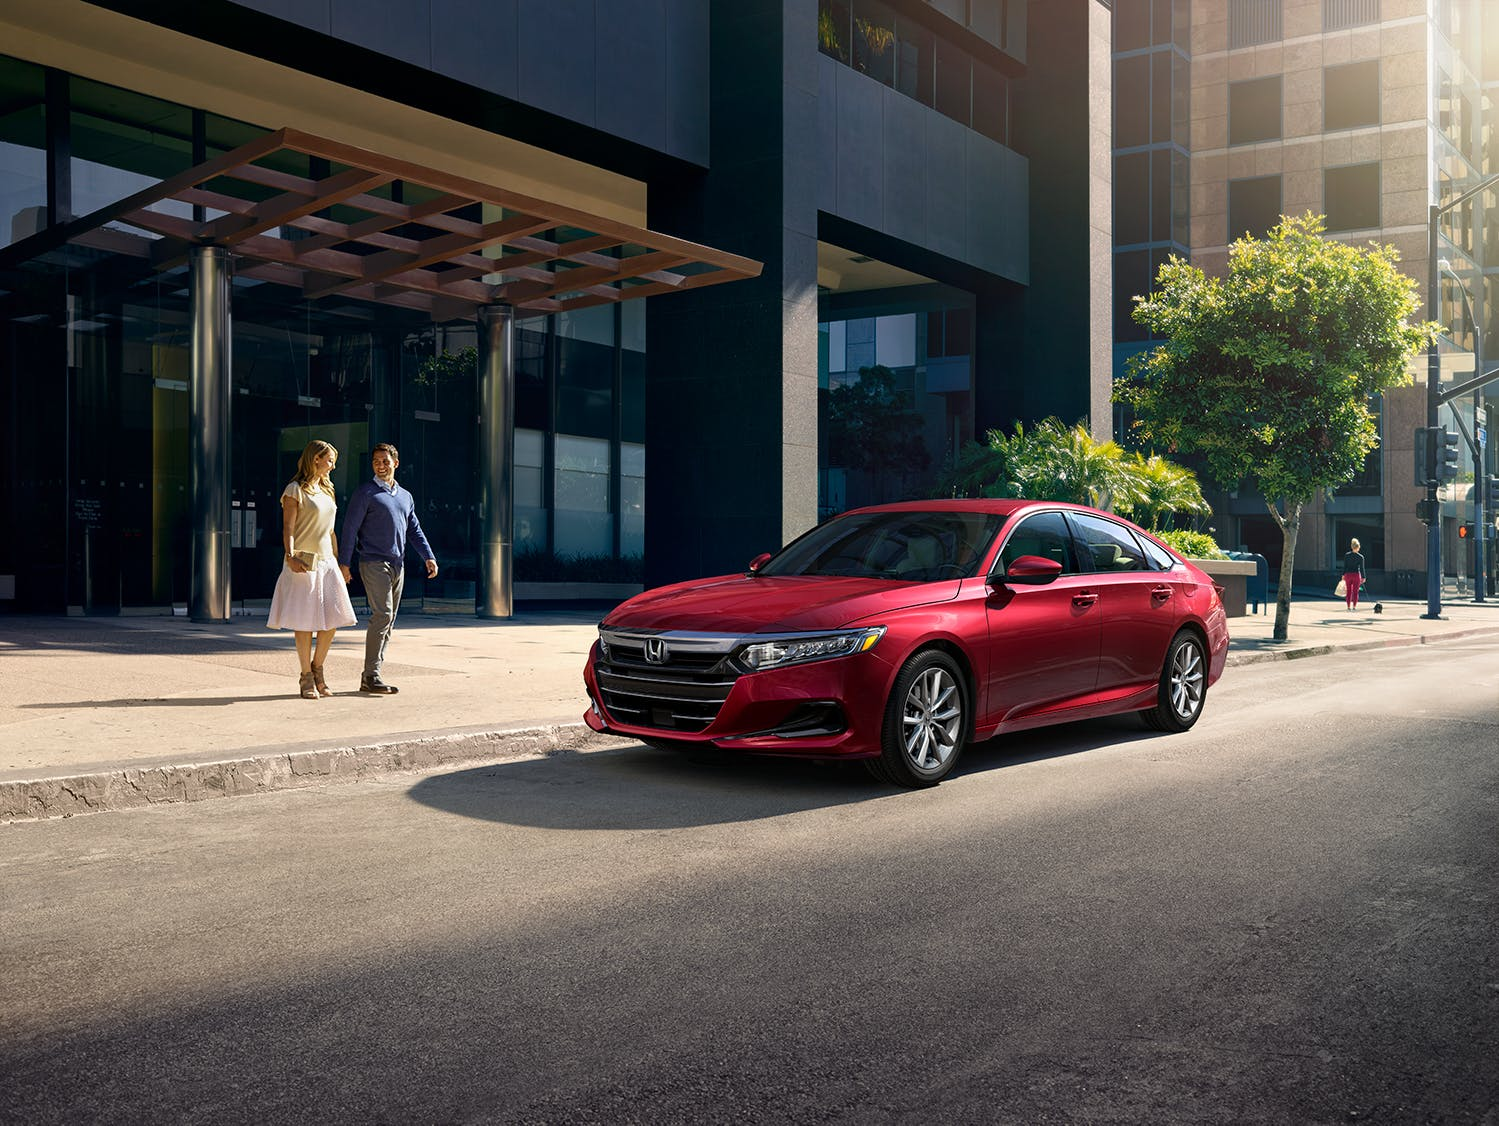 Washington Honda is a Honda Dealership in Washington near Waynesburg PA | 2021 Honda Accord parked outside of building